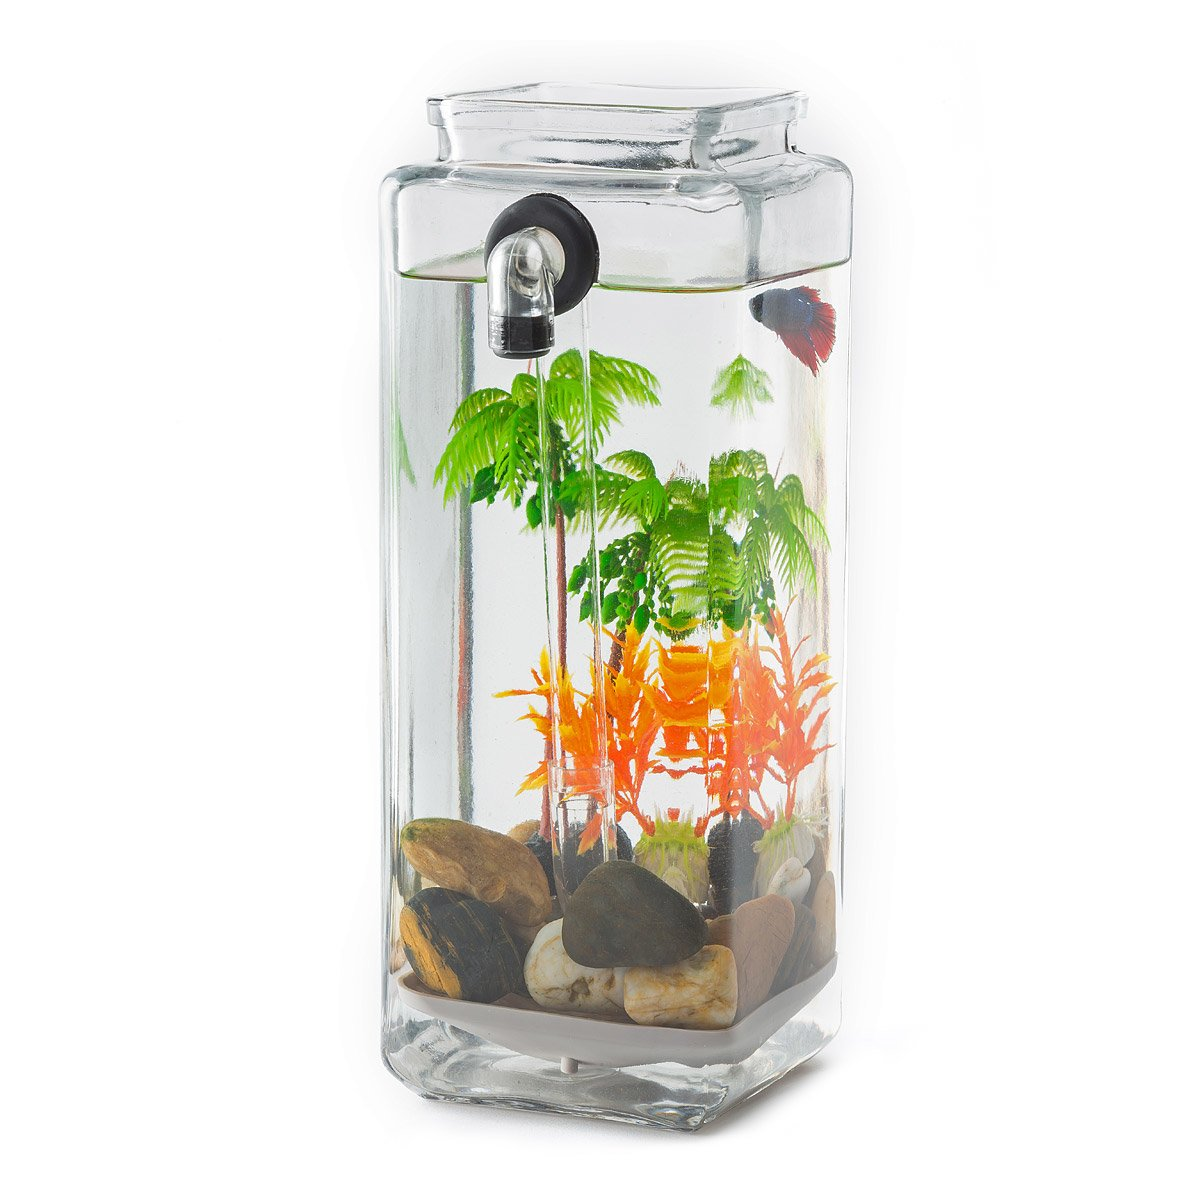 Fish Tank No Clean Aquarium Acrylic Fish Tank Freshwater No Filter